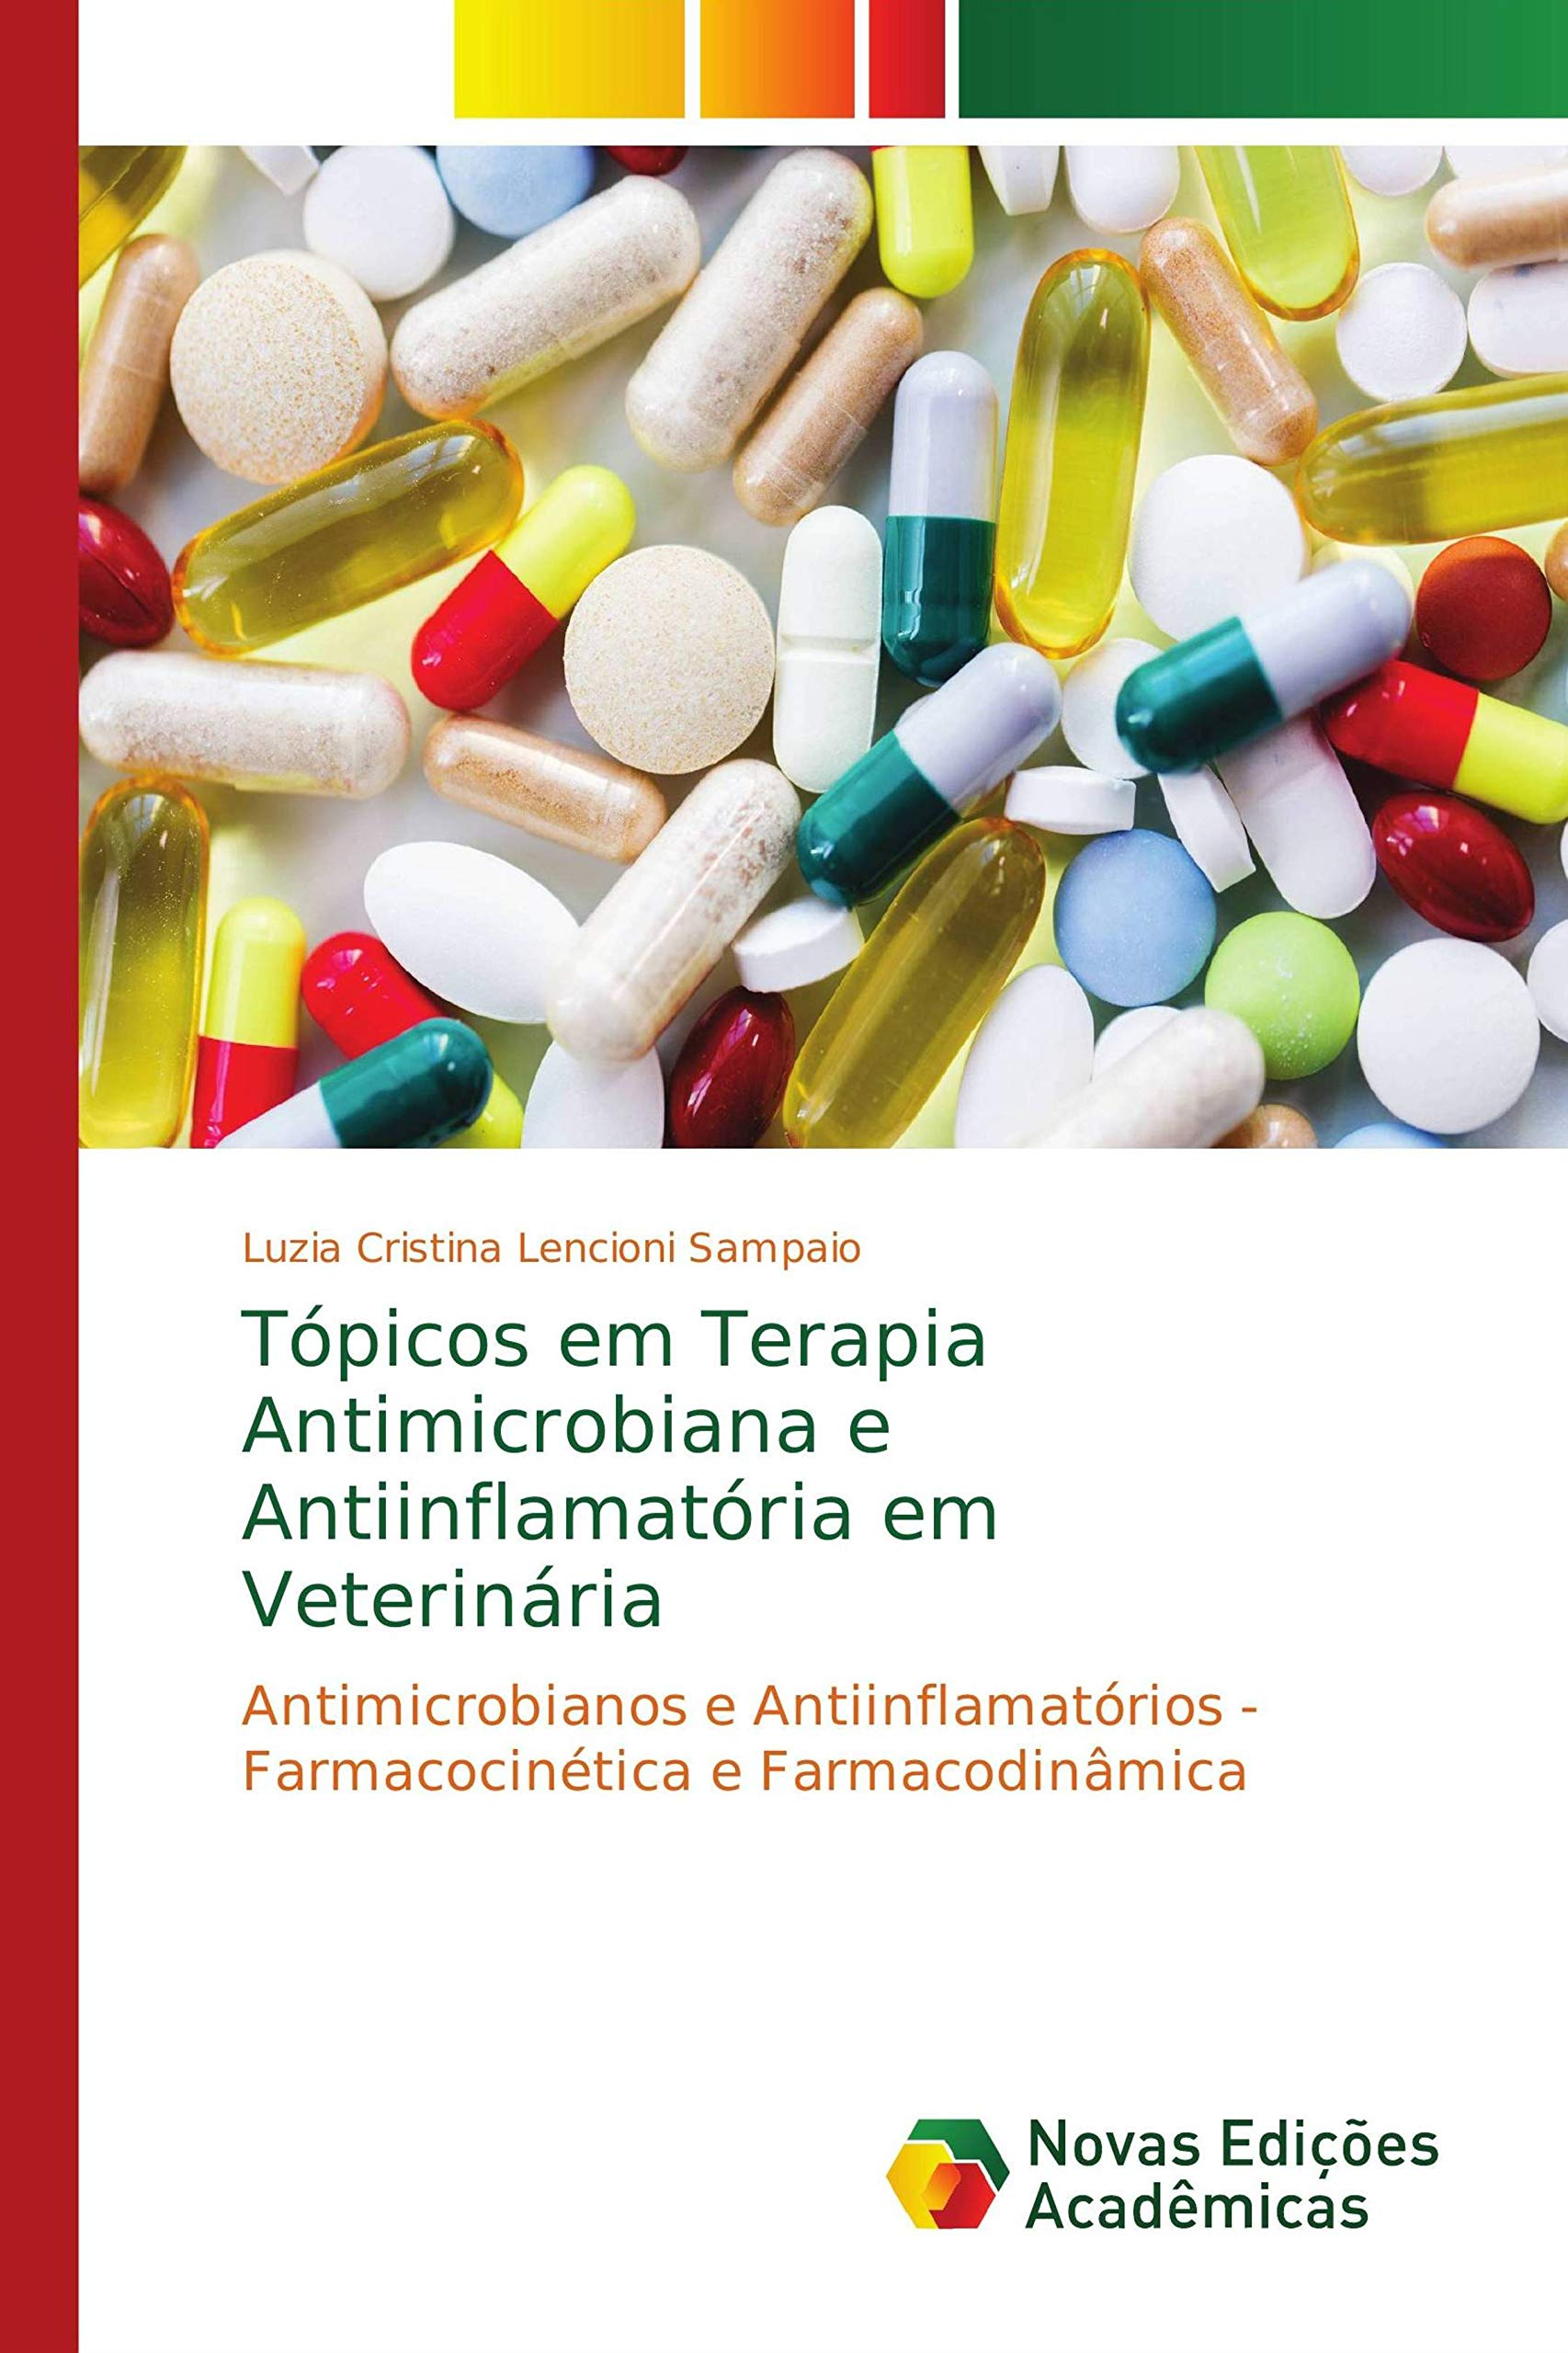 Lencioni Sampaio, L: Tópicos em Terapia Antimicrobiana e Ant: Amazon.es: Lencioni Sampaio, Luzia Cristina: Libros en idiomas extranjeros